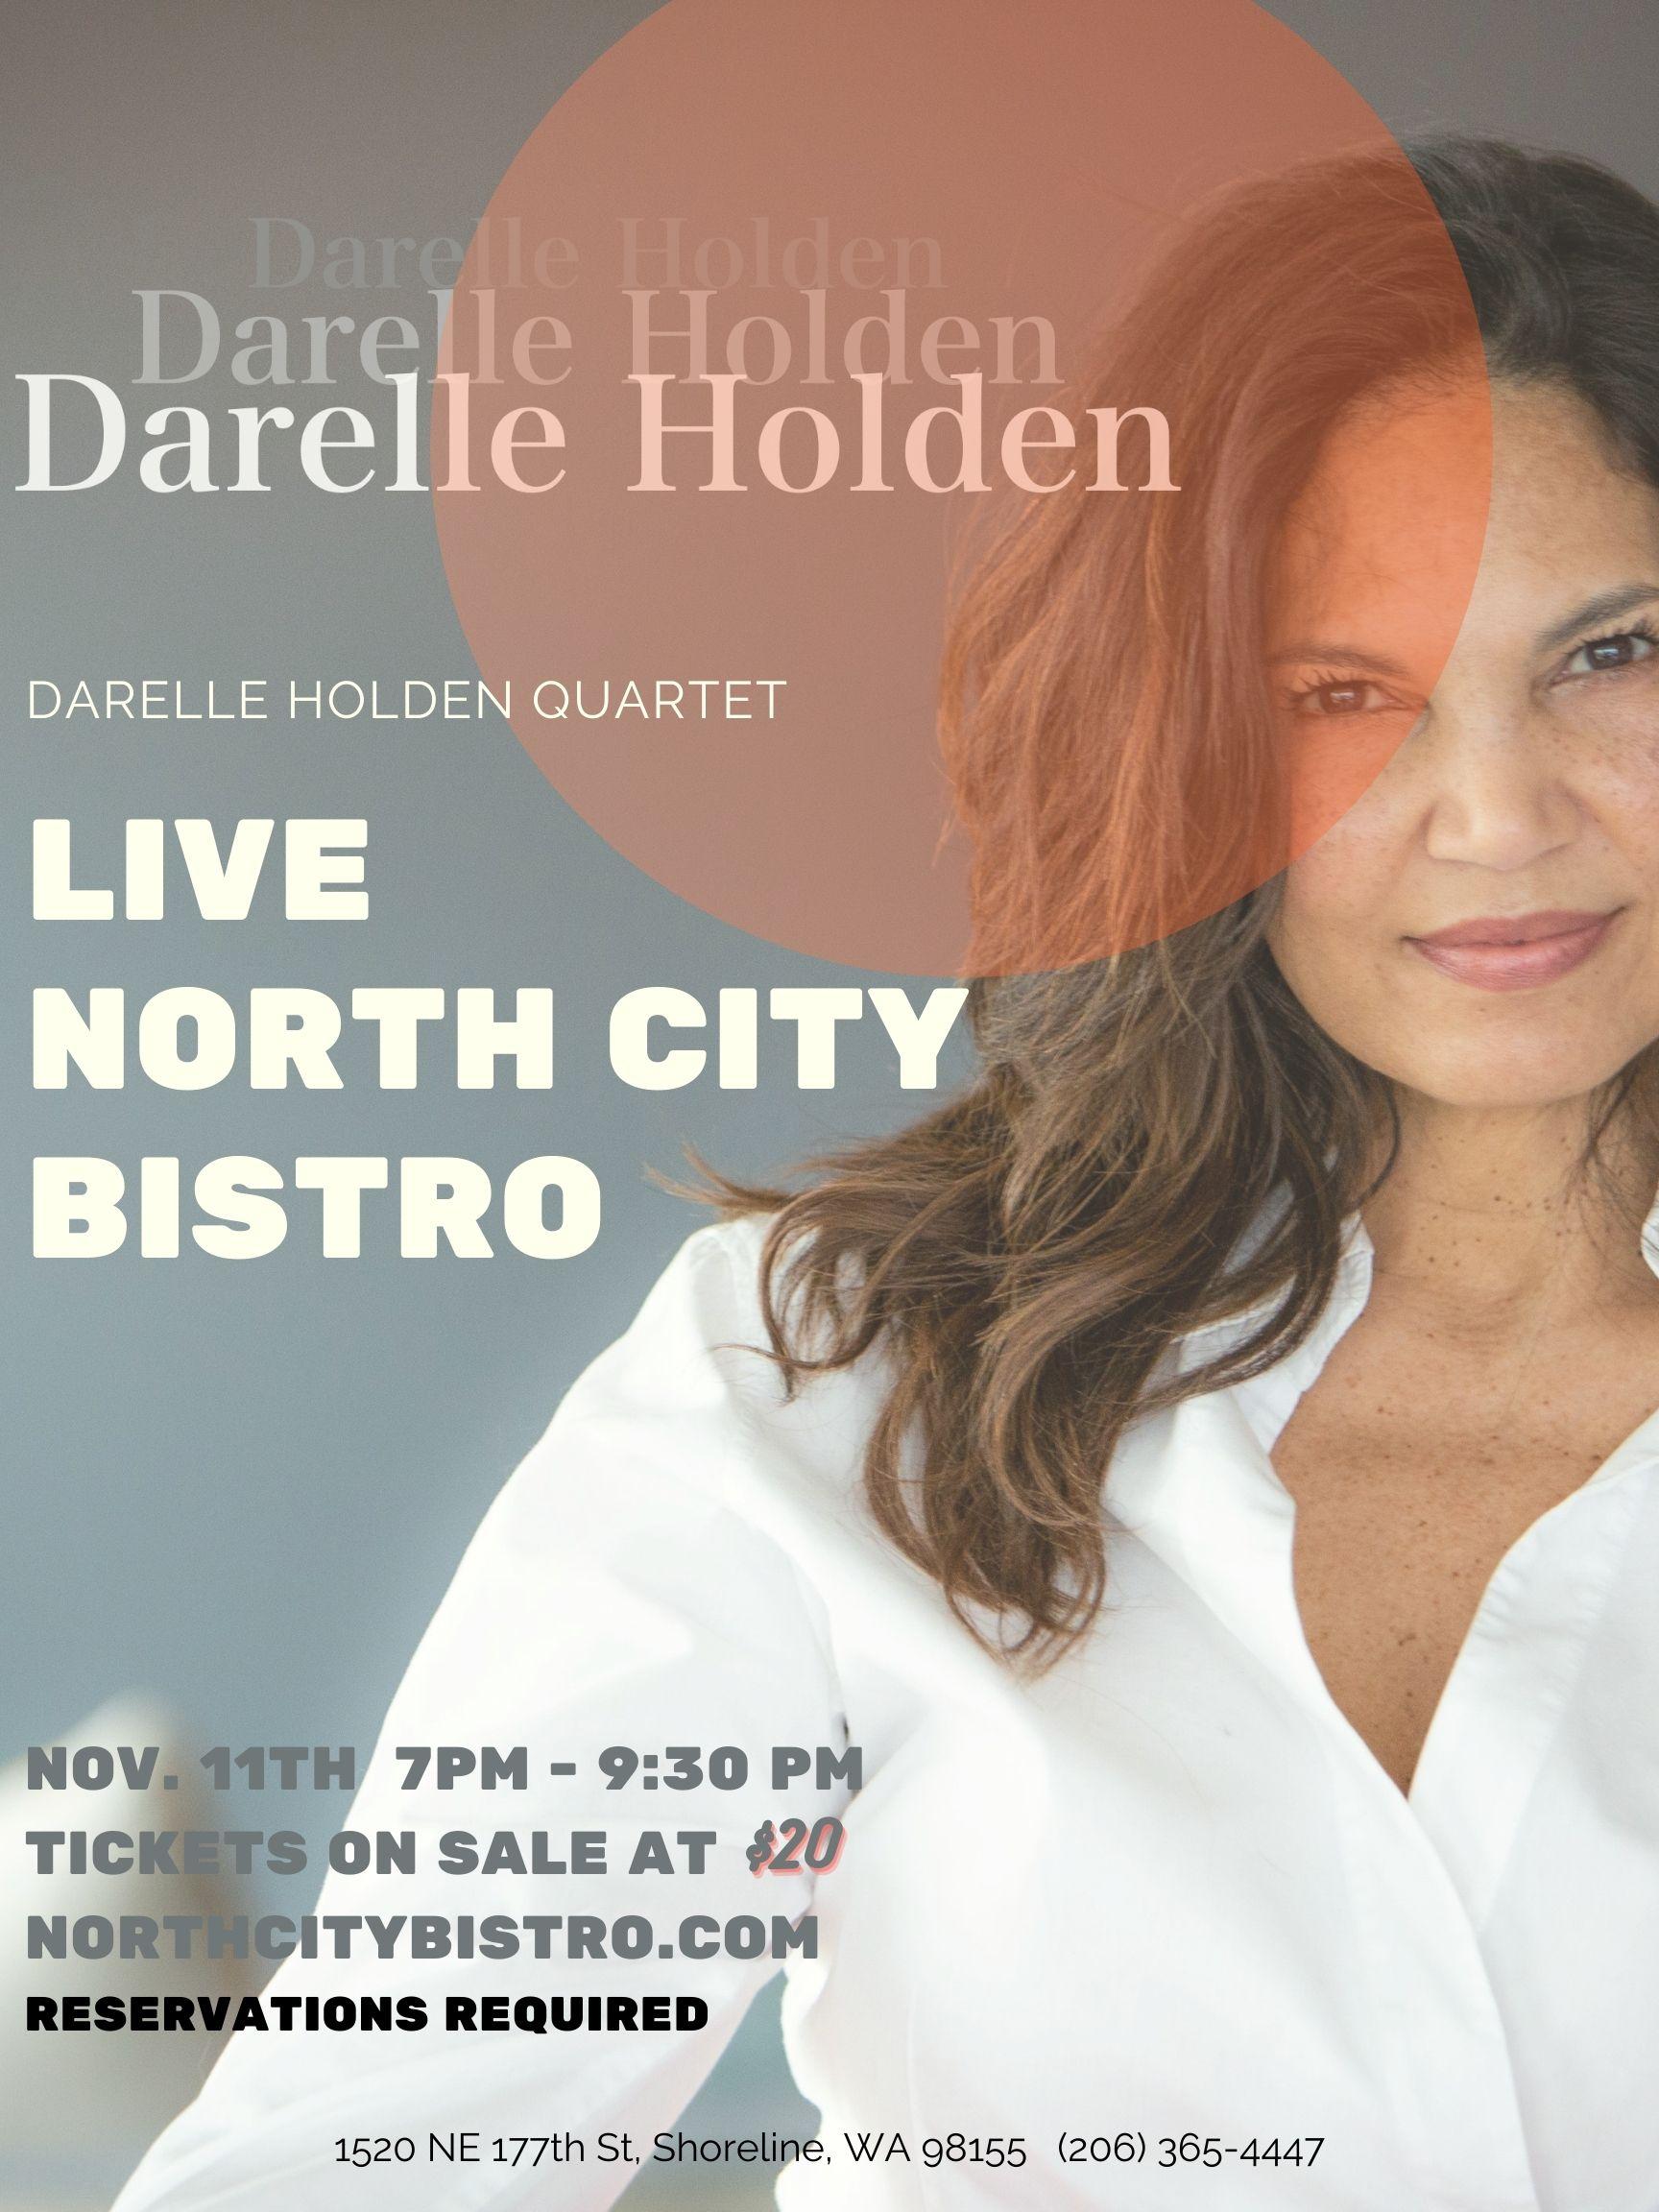 Darelle Holden